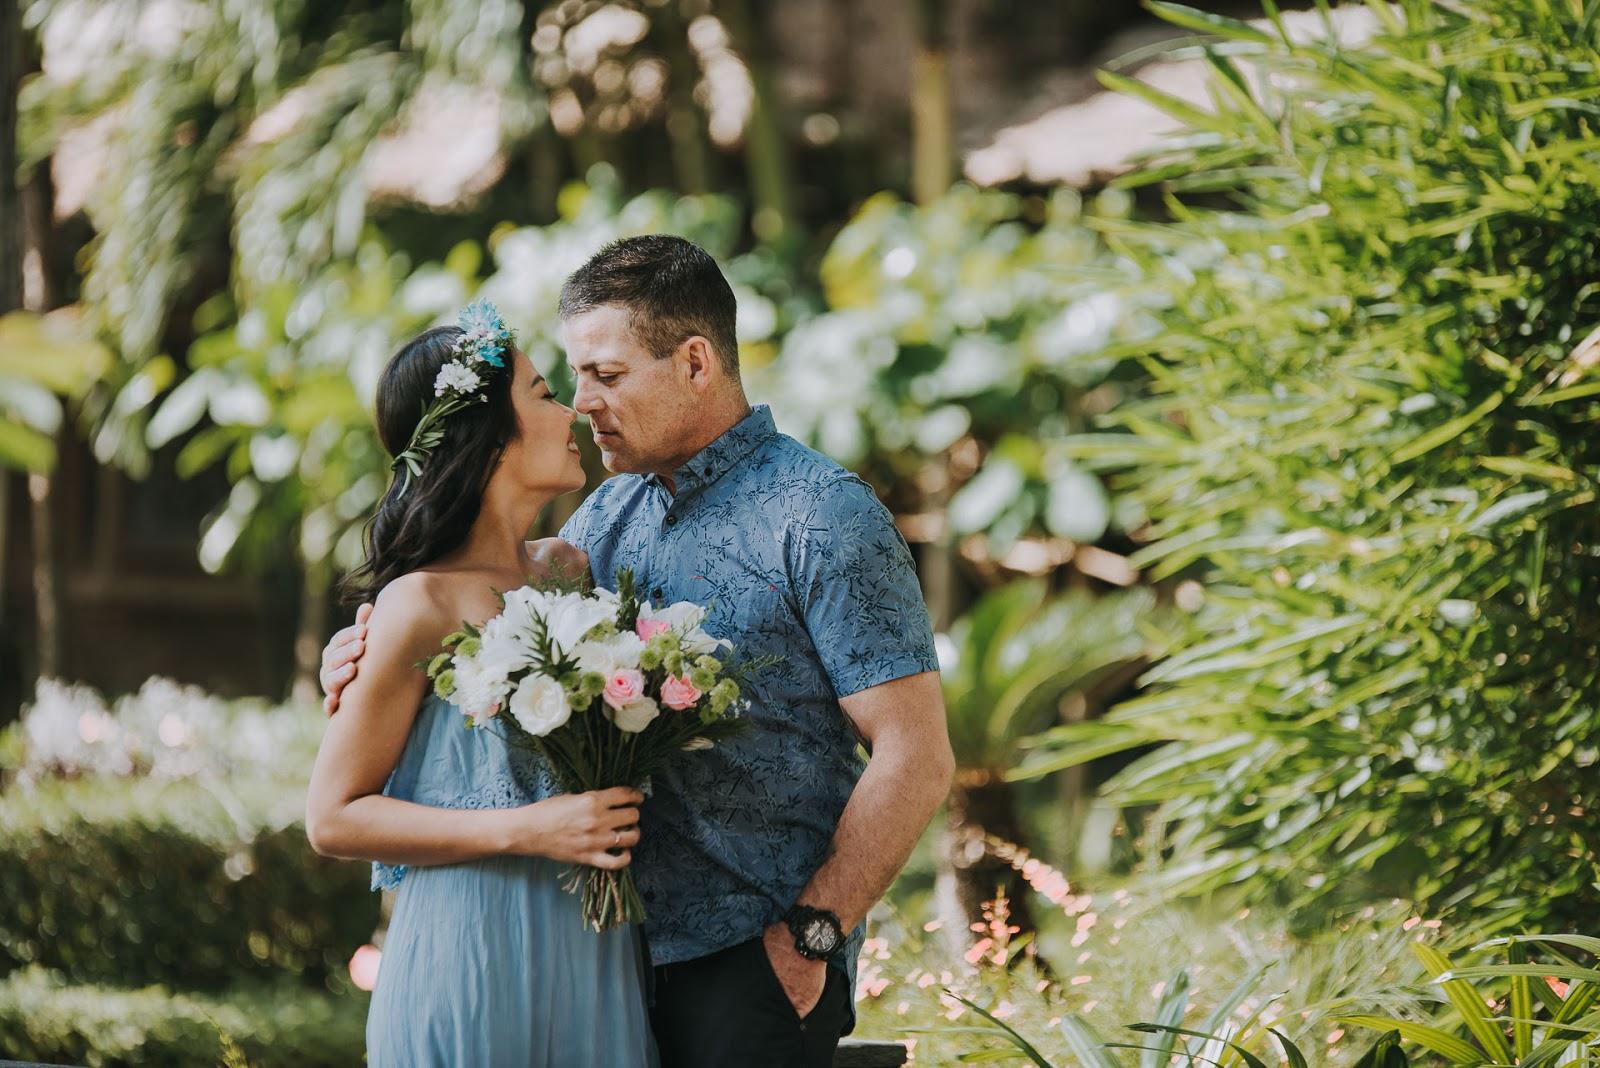 Foto prewedding indoor outdoor murah jakarta bali paket rias make up gaun bridal